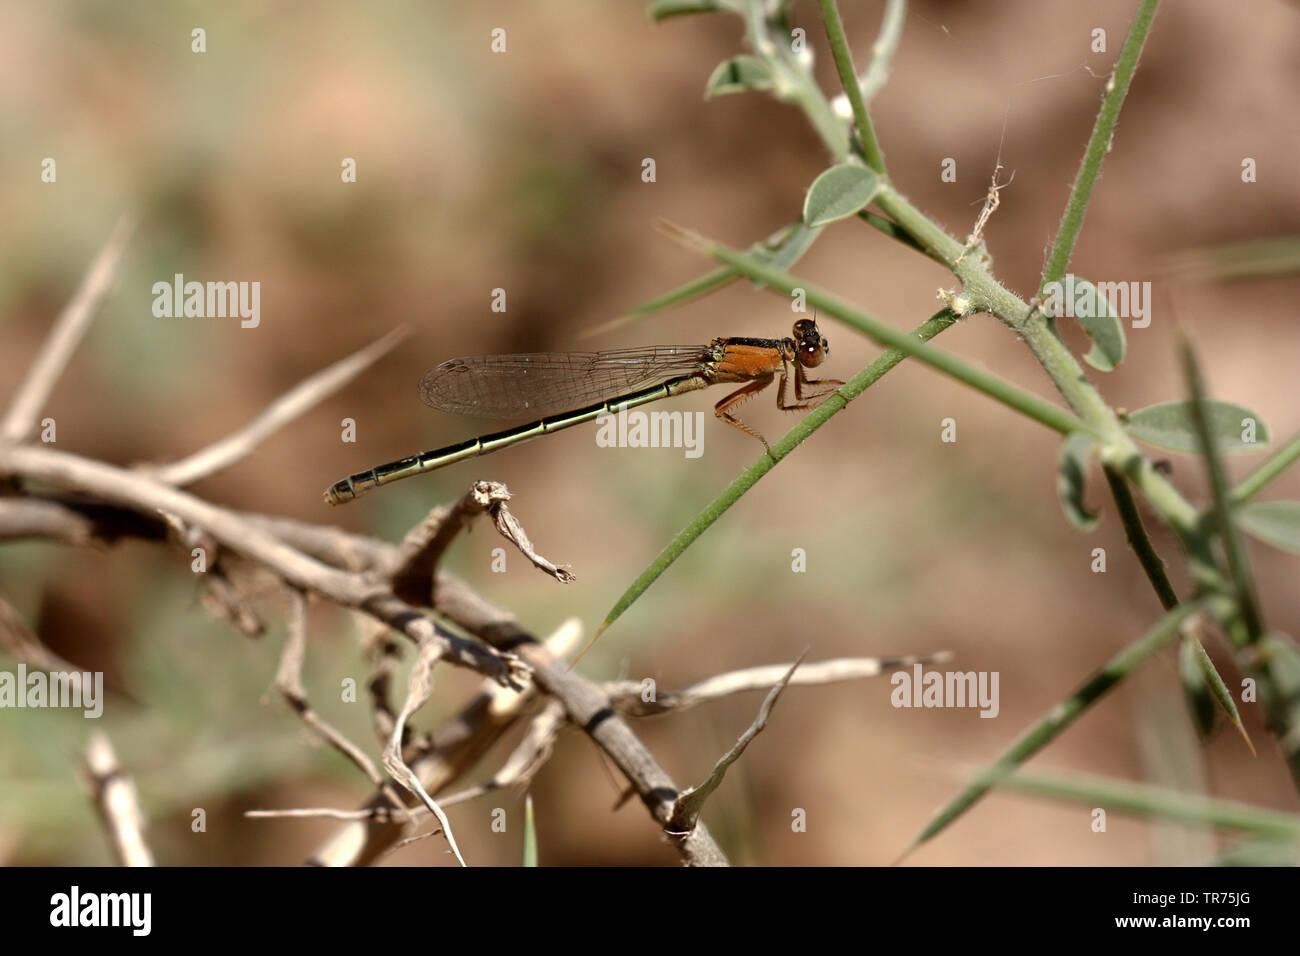 Oasen-Pechlibelle, Oasenpechlibelle (Ischnura fountaineae), junges Weibchen, Syrien, Mheimideh   Oasis Bluetai (Ischnura fountaineae), immature female - Stock Image